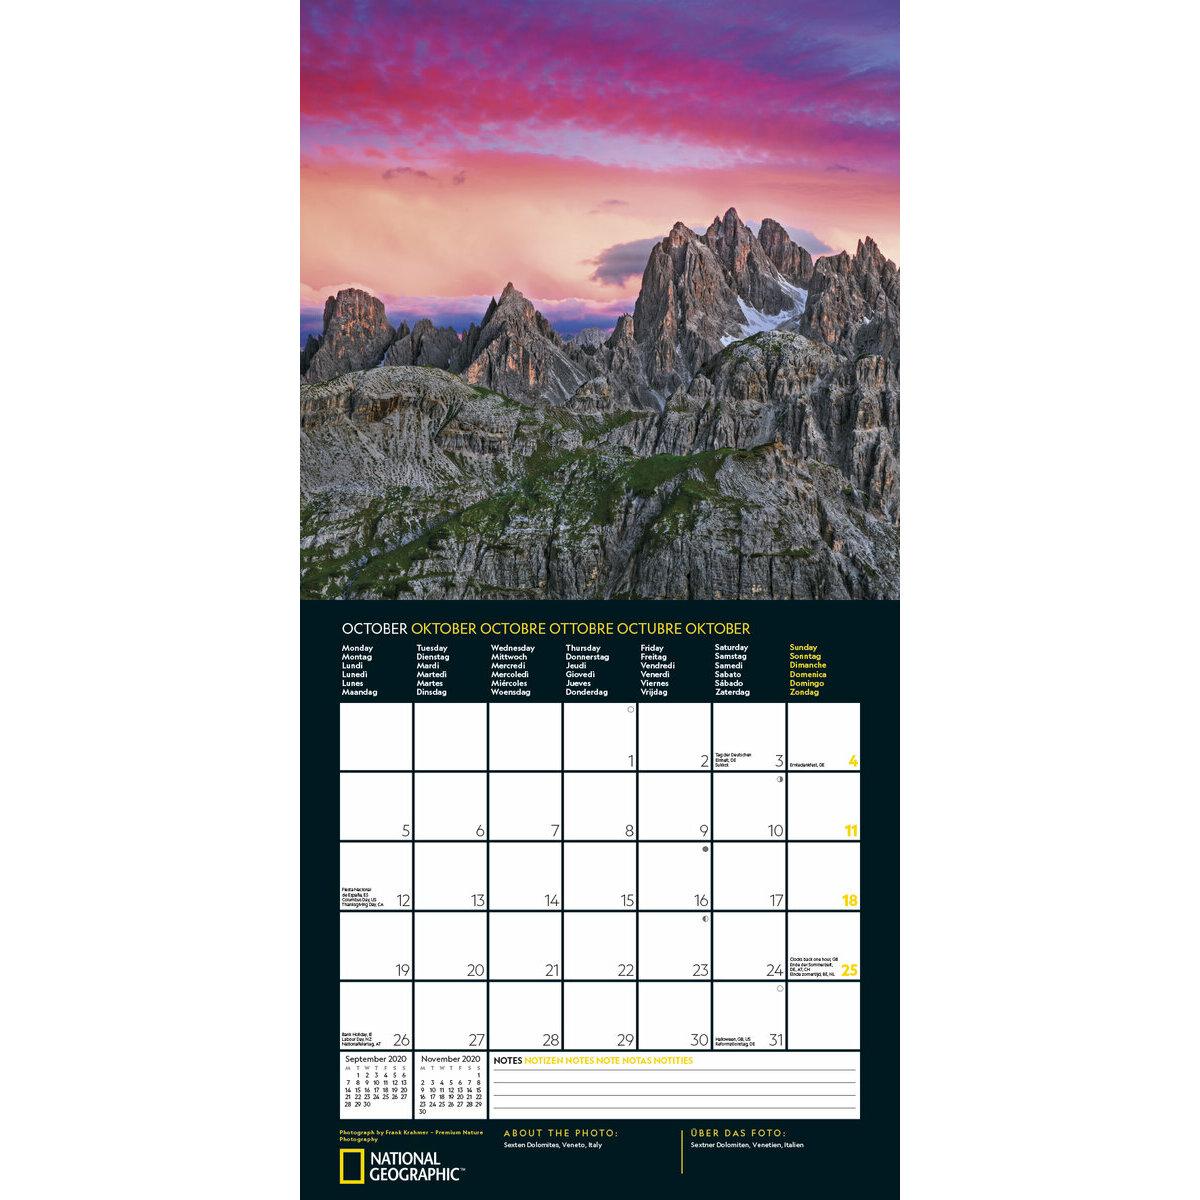 Calendrier Soleil.Calendrier 2020 National Geographic Couche De Soleil